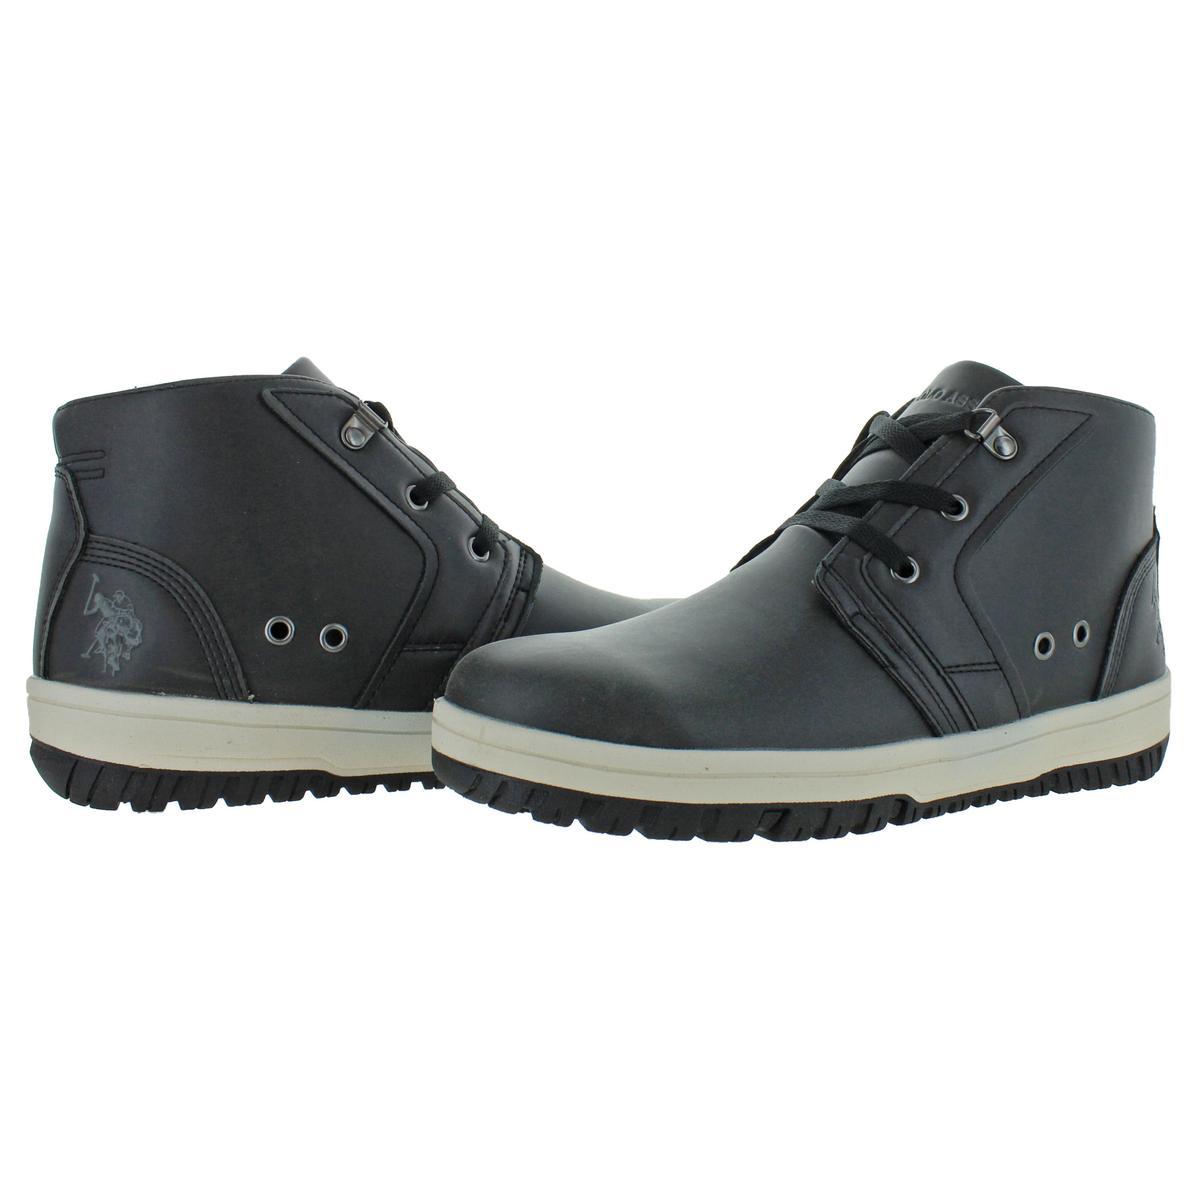 thumbnail 3 - U.S. Polo Assn. Bruno Men's Fashion Chukka Ankle Boots